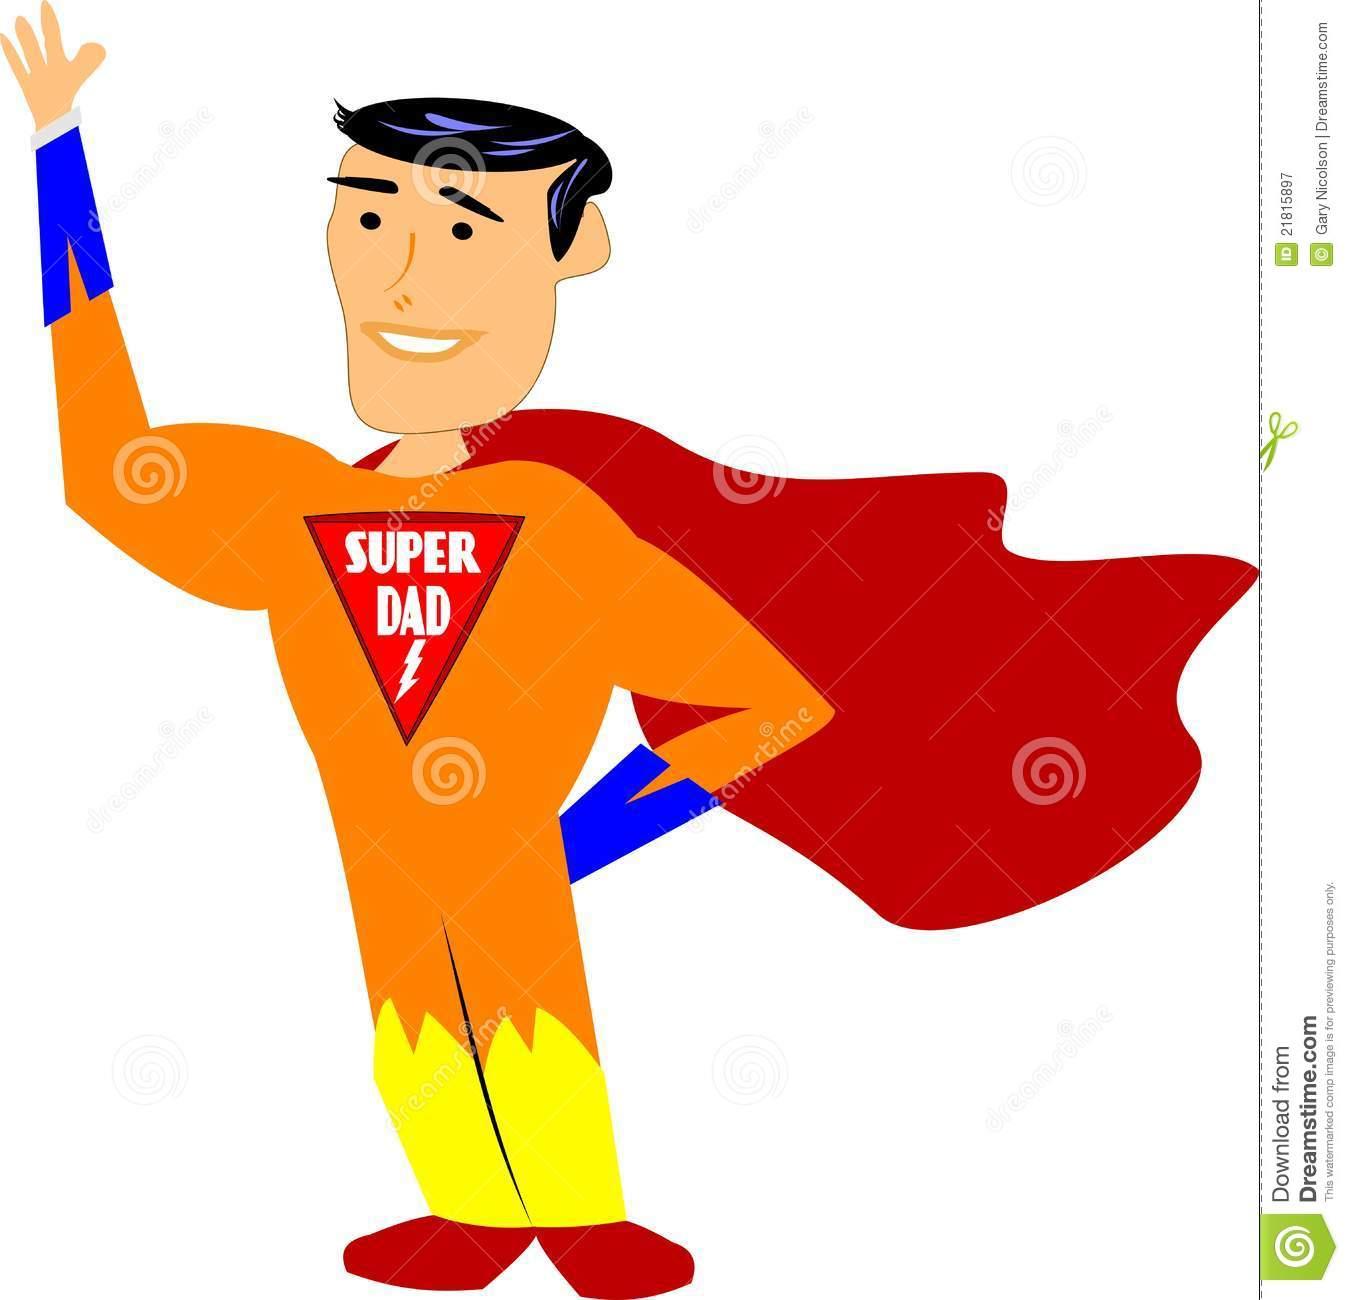 Super dad clipart png freeuse Super Dad Stock Illustrations – 303 Super Dad Stock Illustrations ... png freeuse